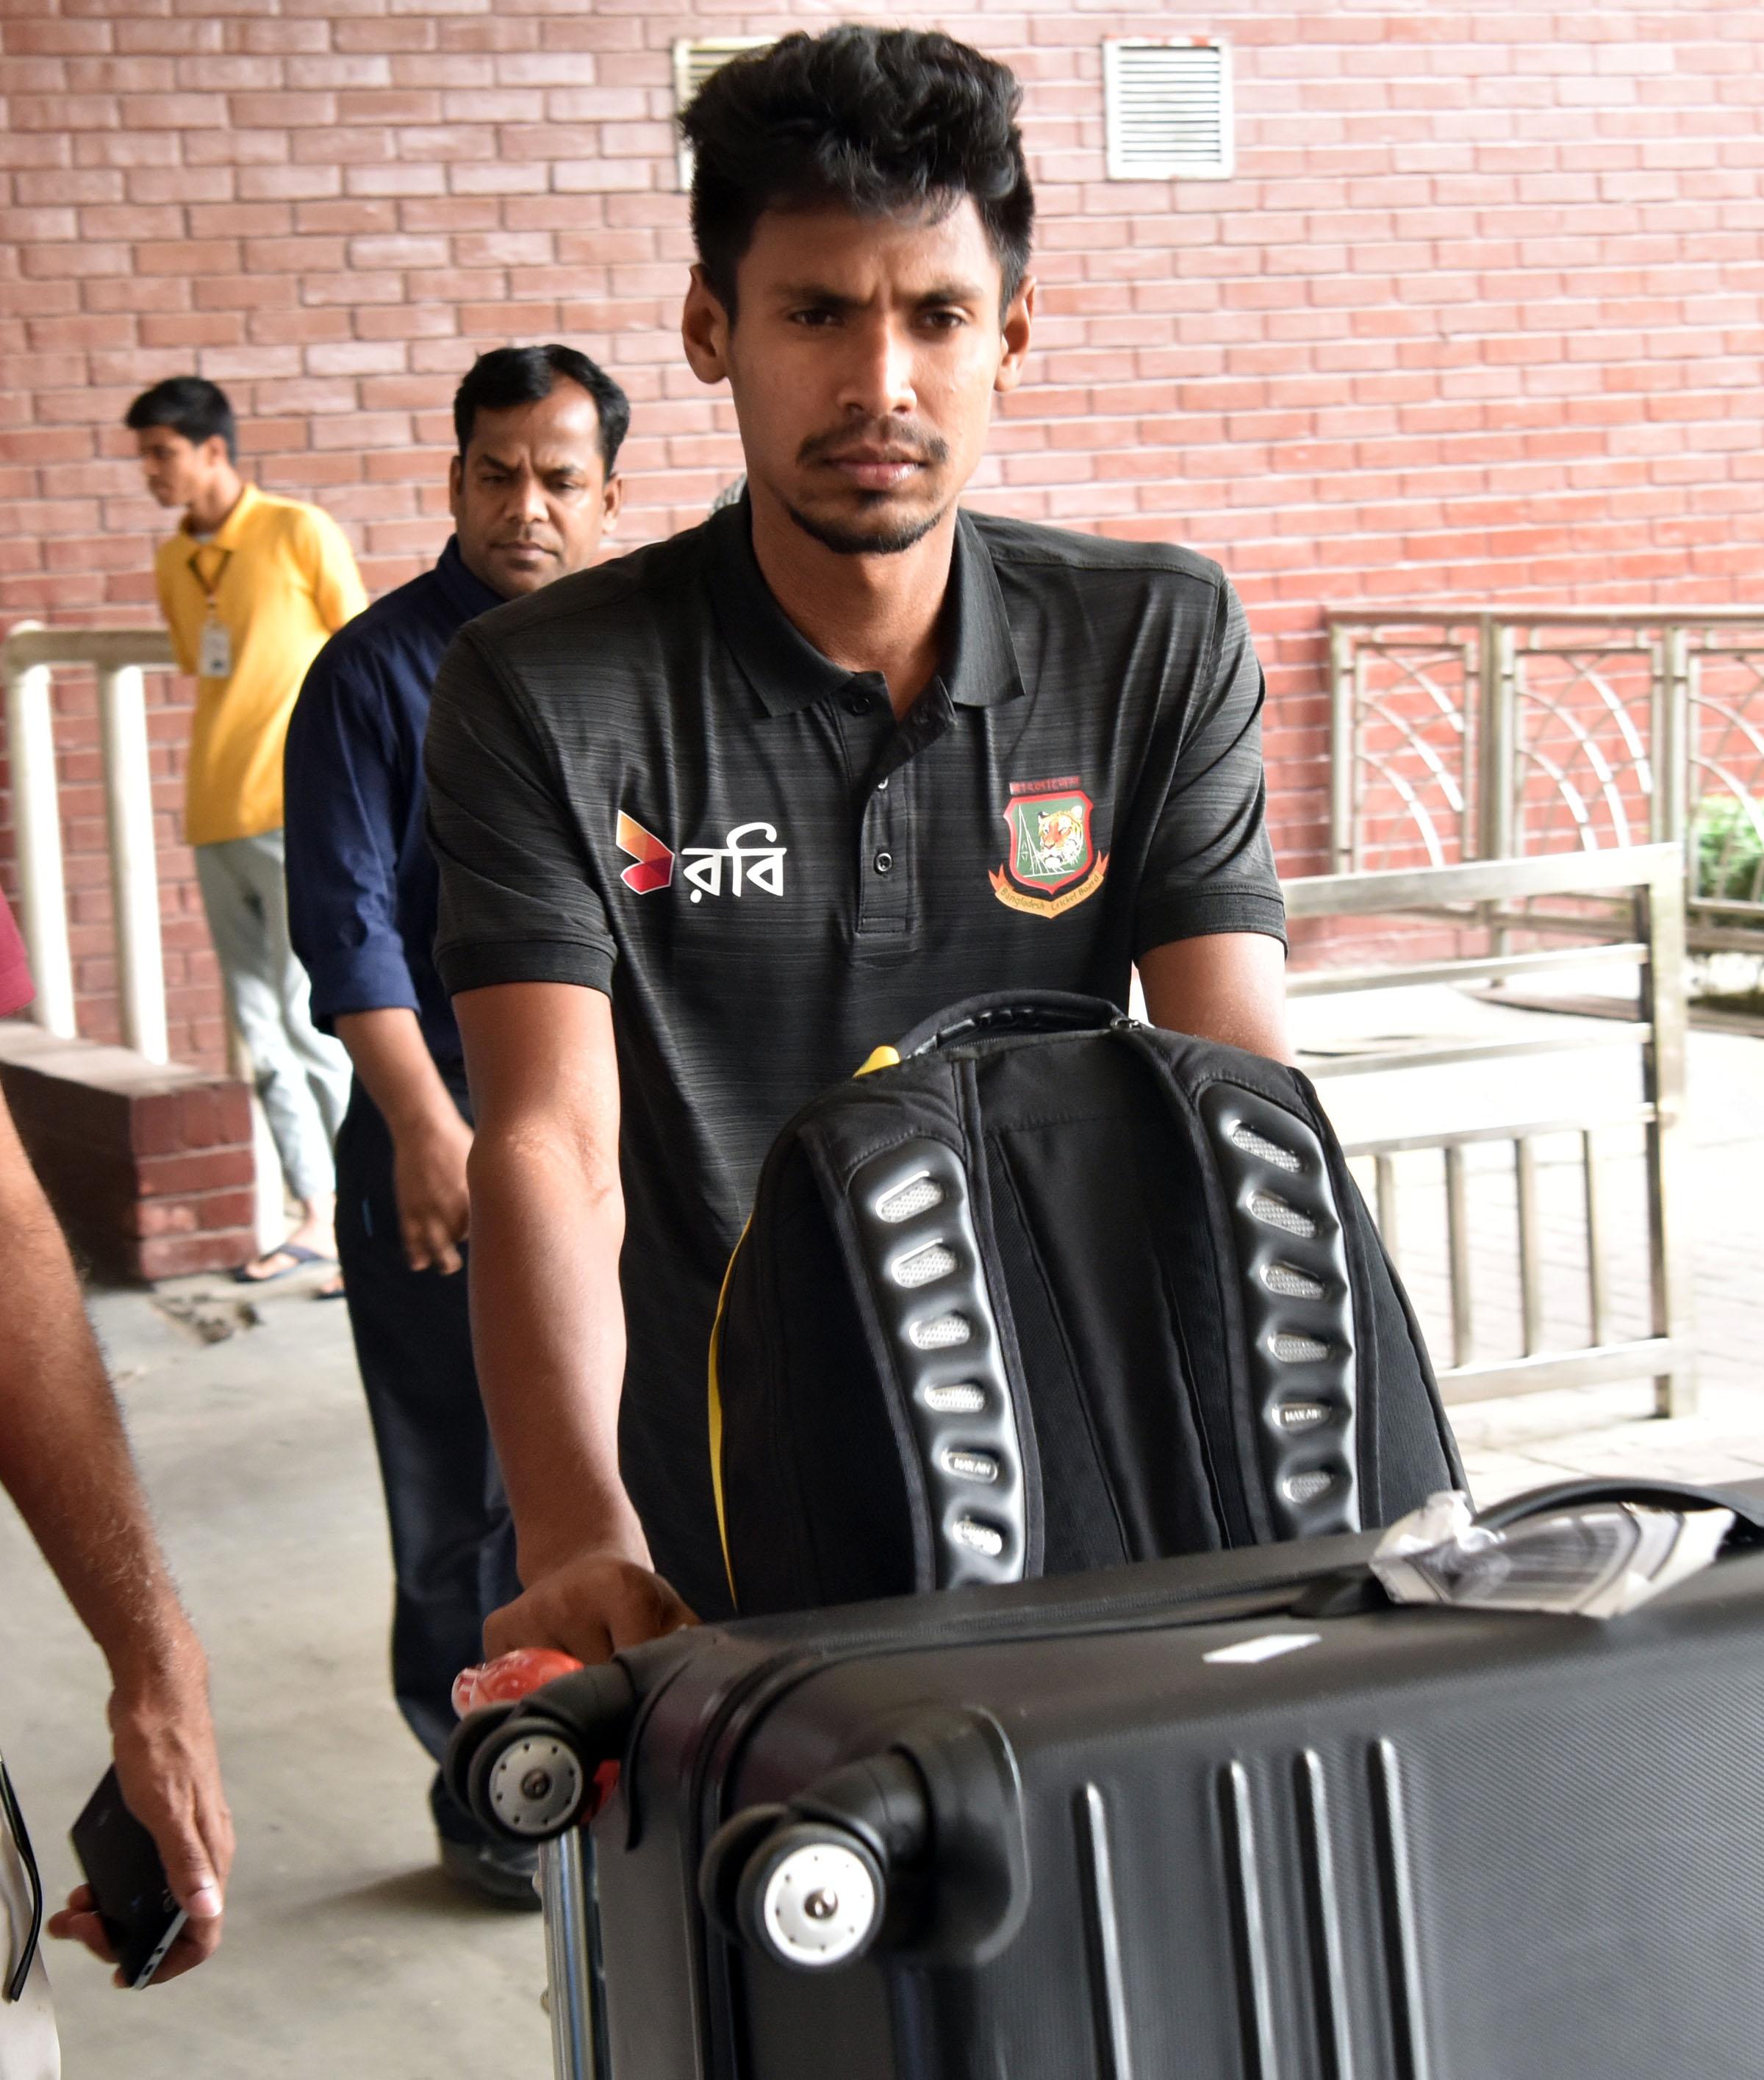 Bangladesh cricket team return home